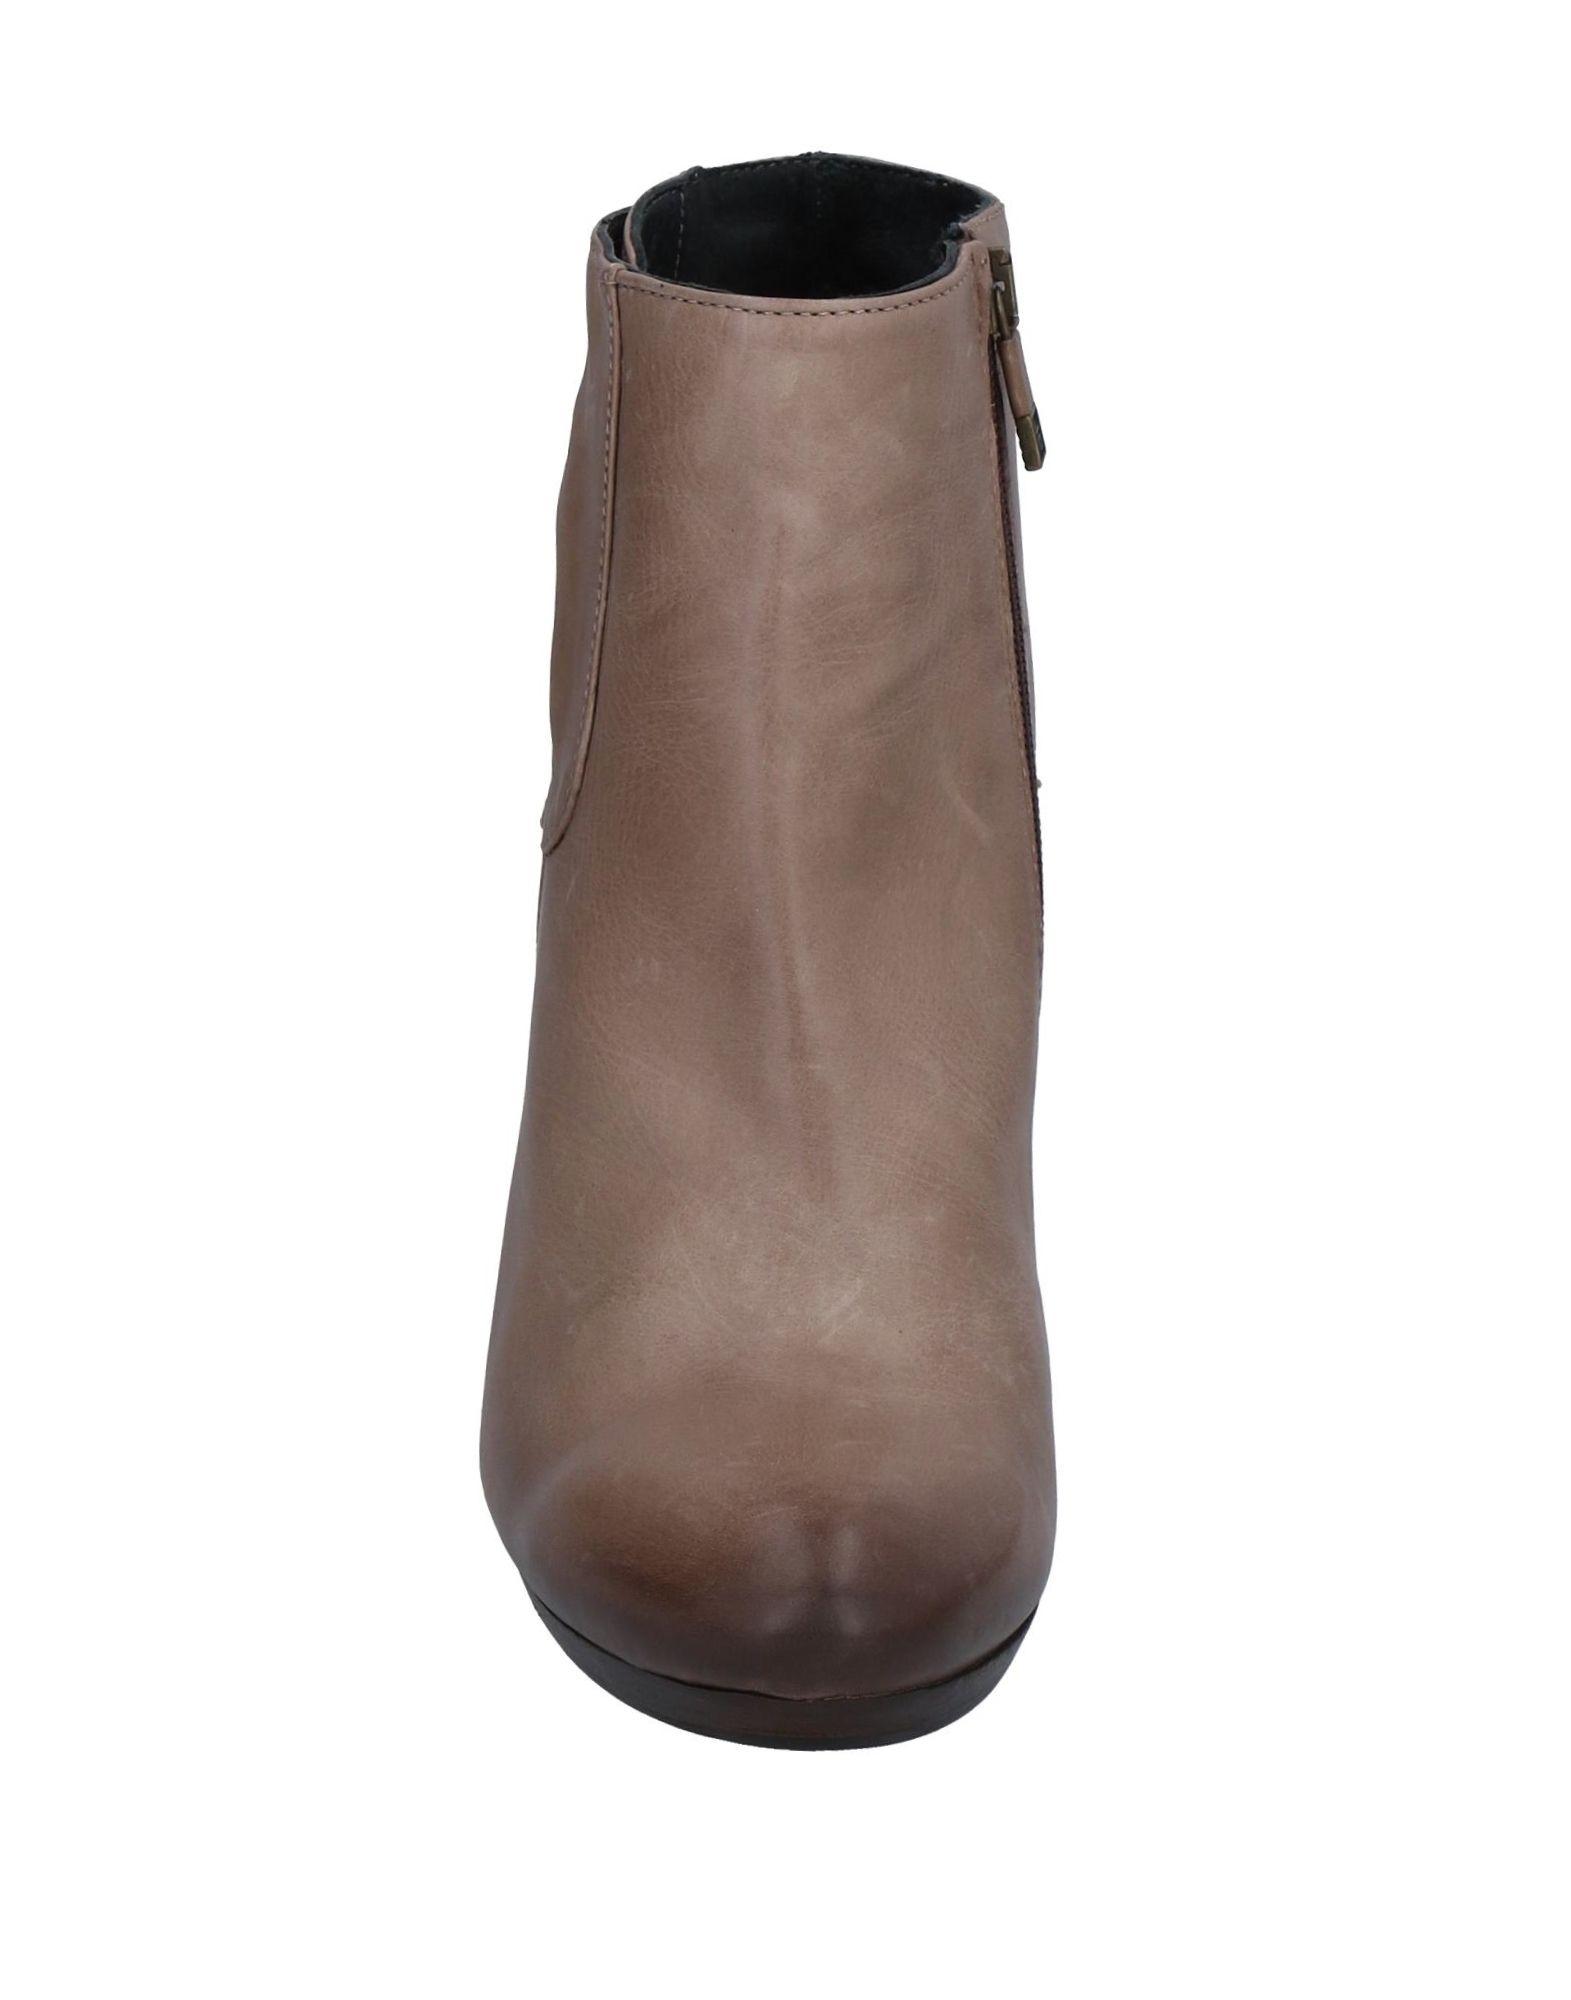 Gut um billige Damen Schuhe zu tragenAlberto Fermani Stiefelette Damen billige  11514041HT 2840e2